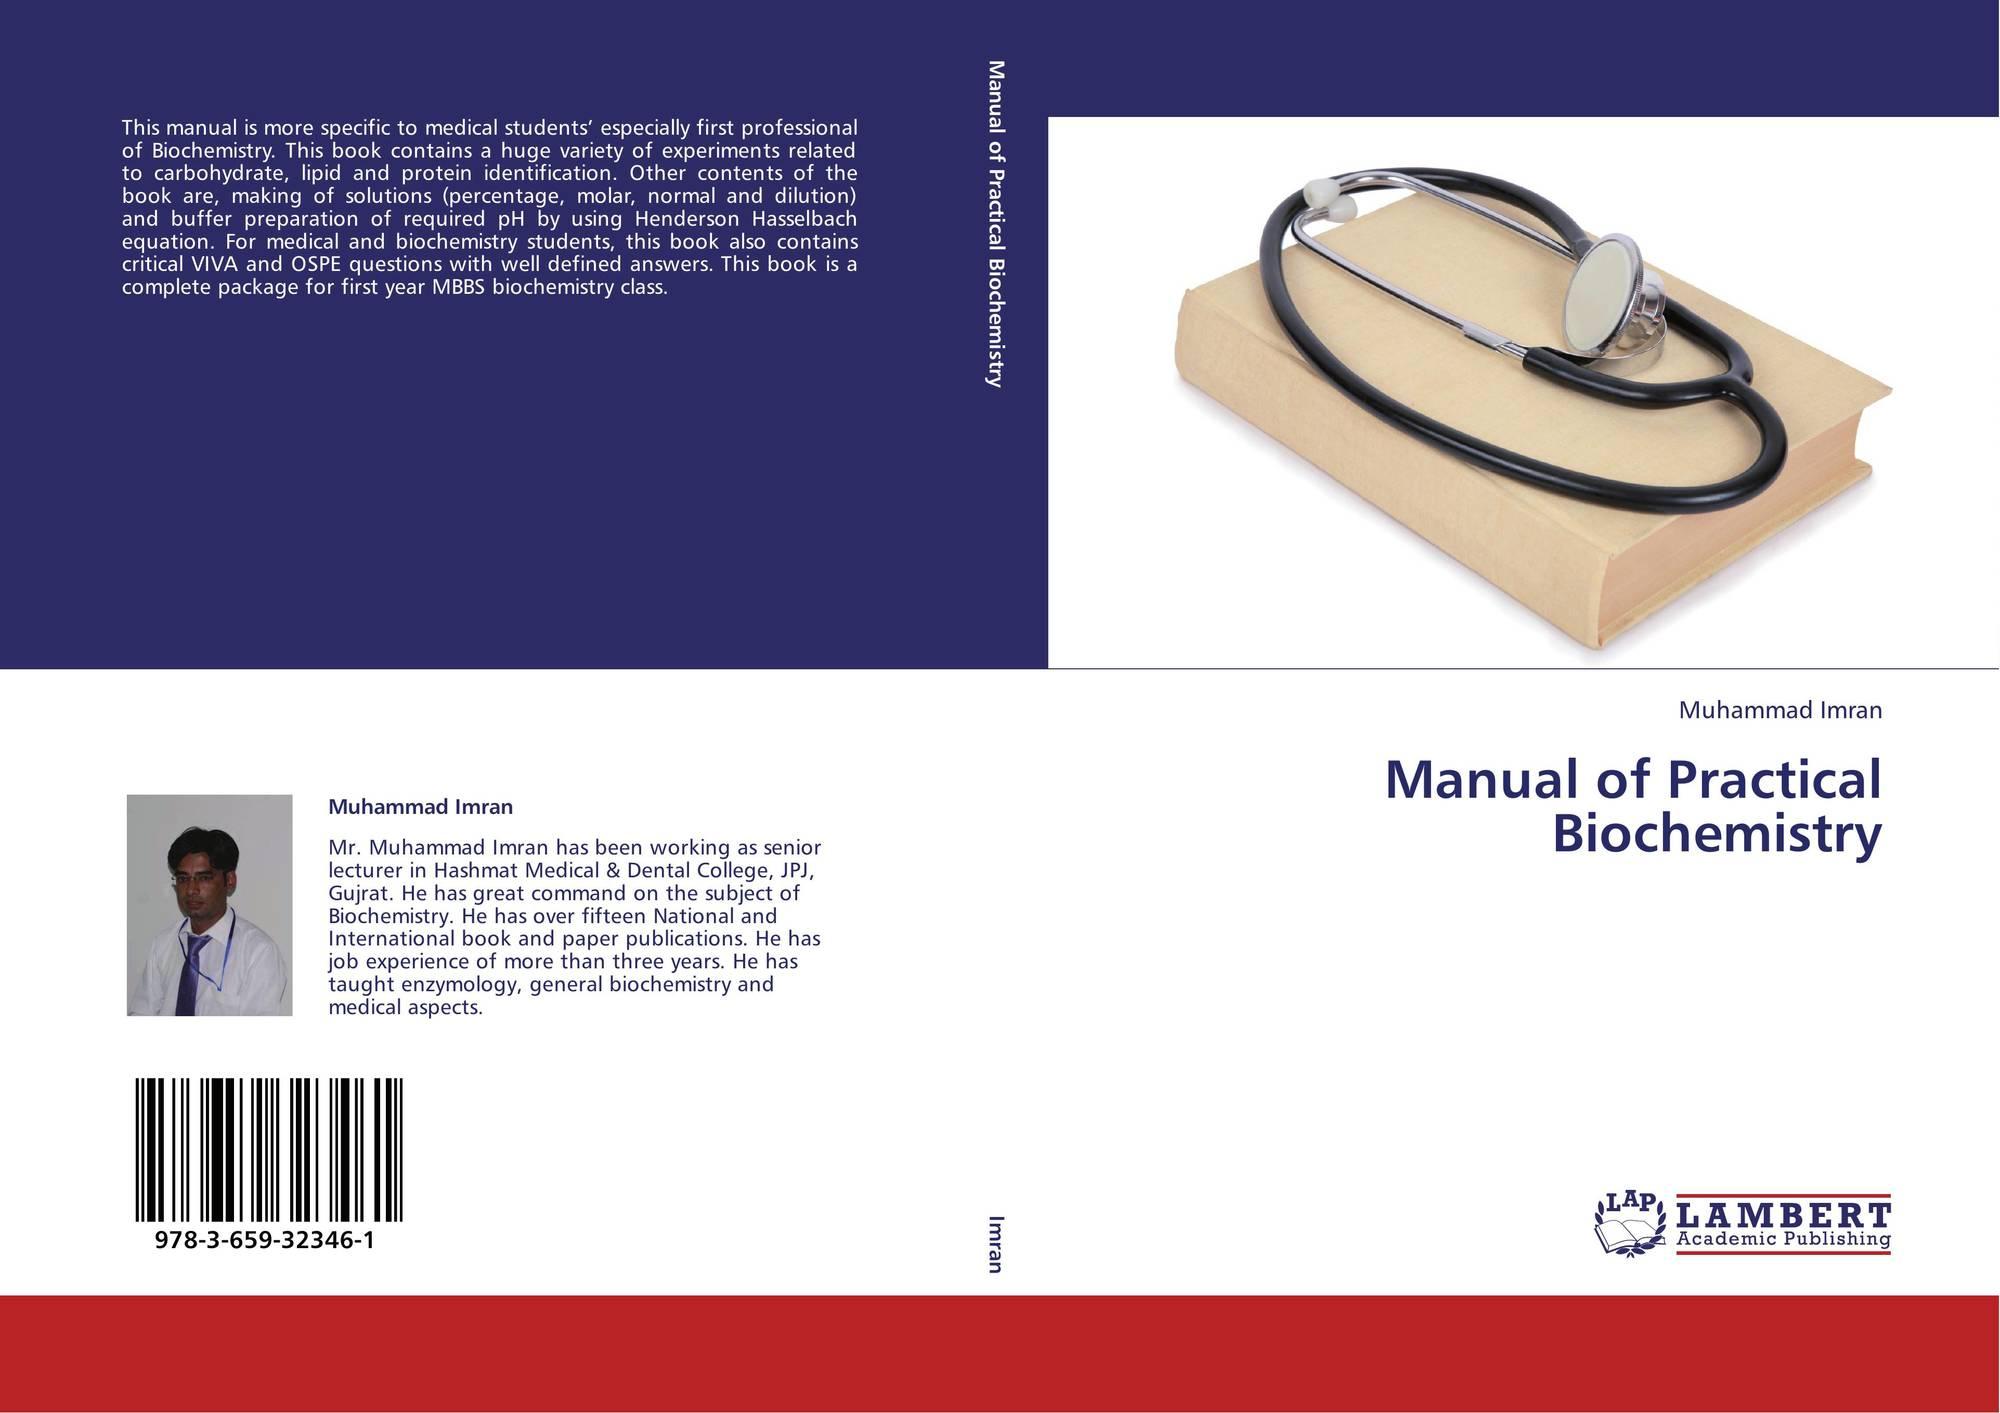 Manual Of Practical Biochemistry 978 3 659 32346 1 3659323462